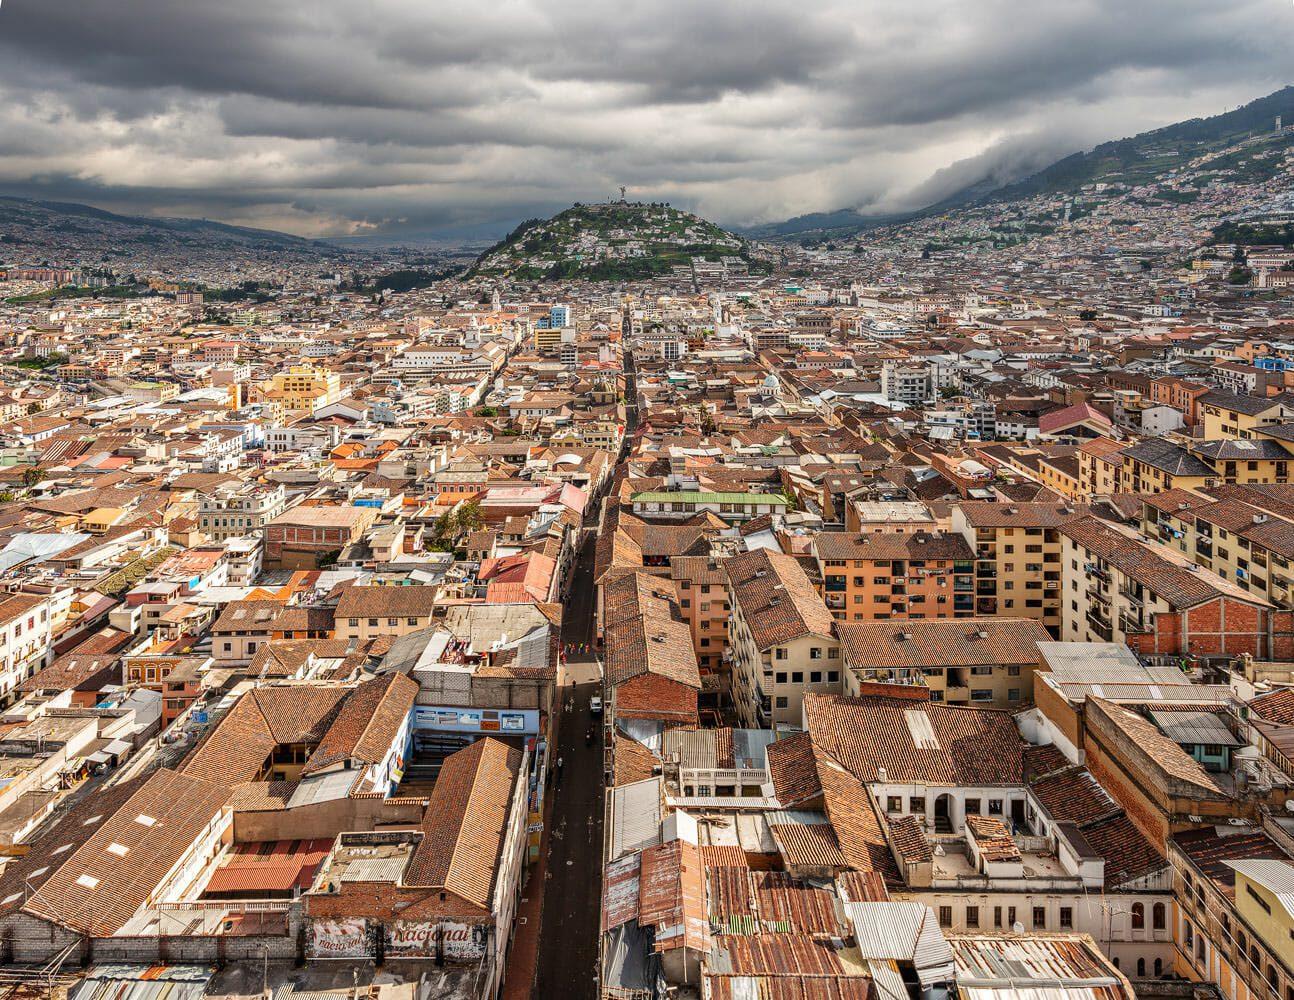 Calle Venezuela, Panecillo hill and Quito old town